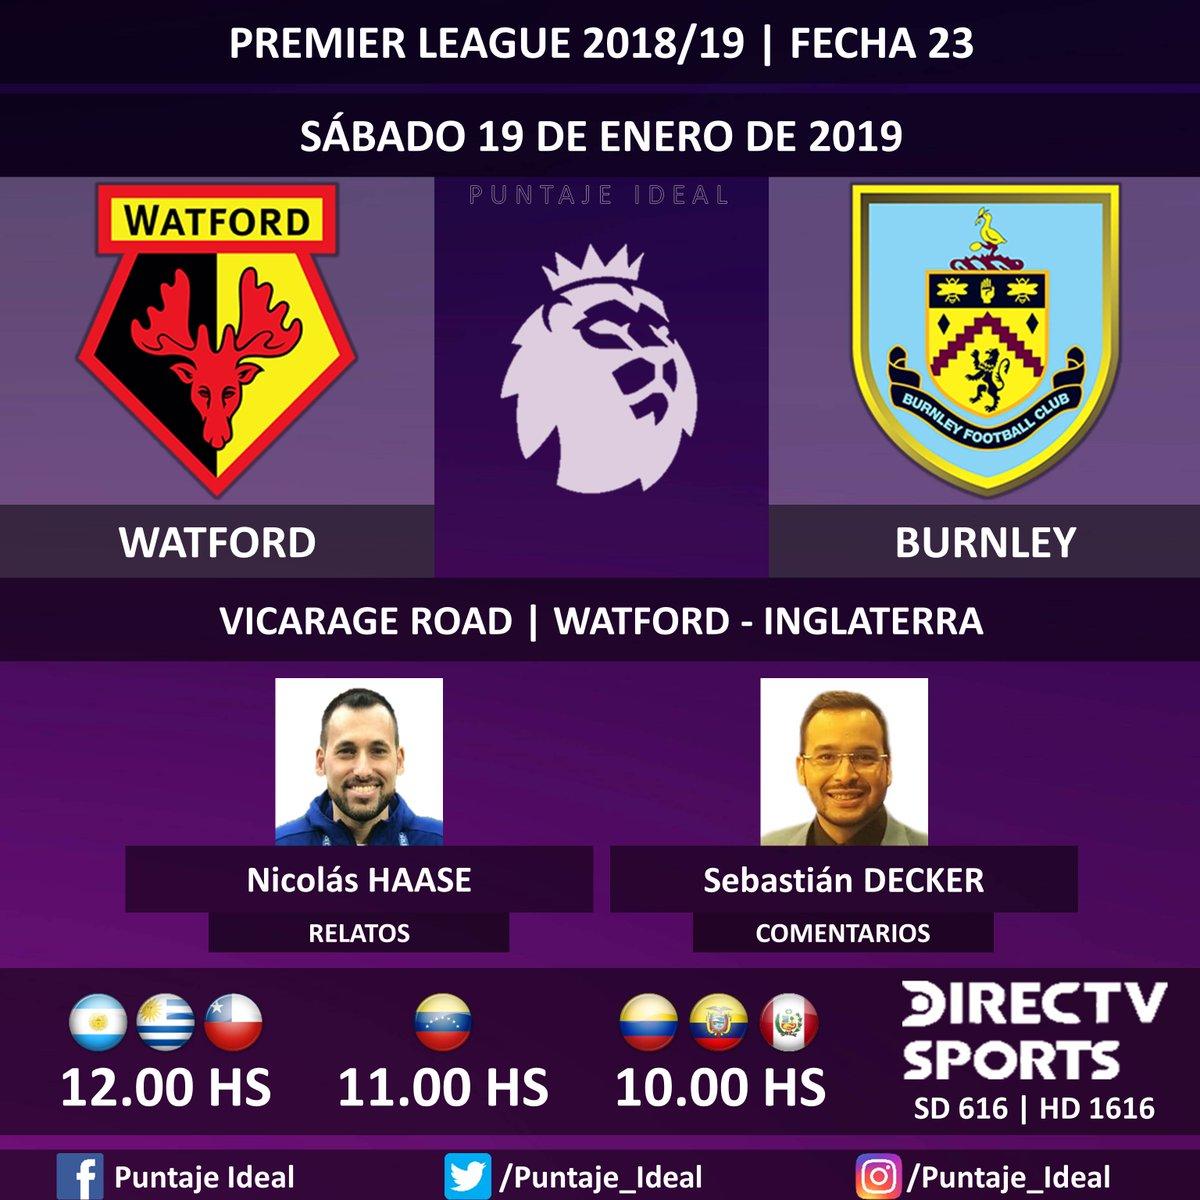 ⚽ #FútbolEnDIRECTV | #Watford vs. #Burnley 🎙 Relatos: @haasenico  🎙 Comentarios: @SebasDecker  📺 TV: @DIRECTVSports Sudamérica (616 - 1616 HD) - #Torneos 🤳 #SoySportista - #PremierLeague 🏴 - #WATBUR  Dale RT 🔃